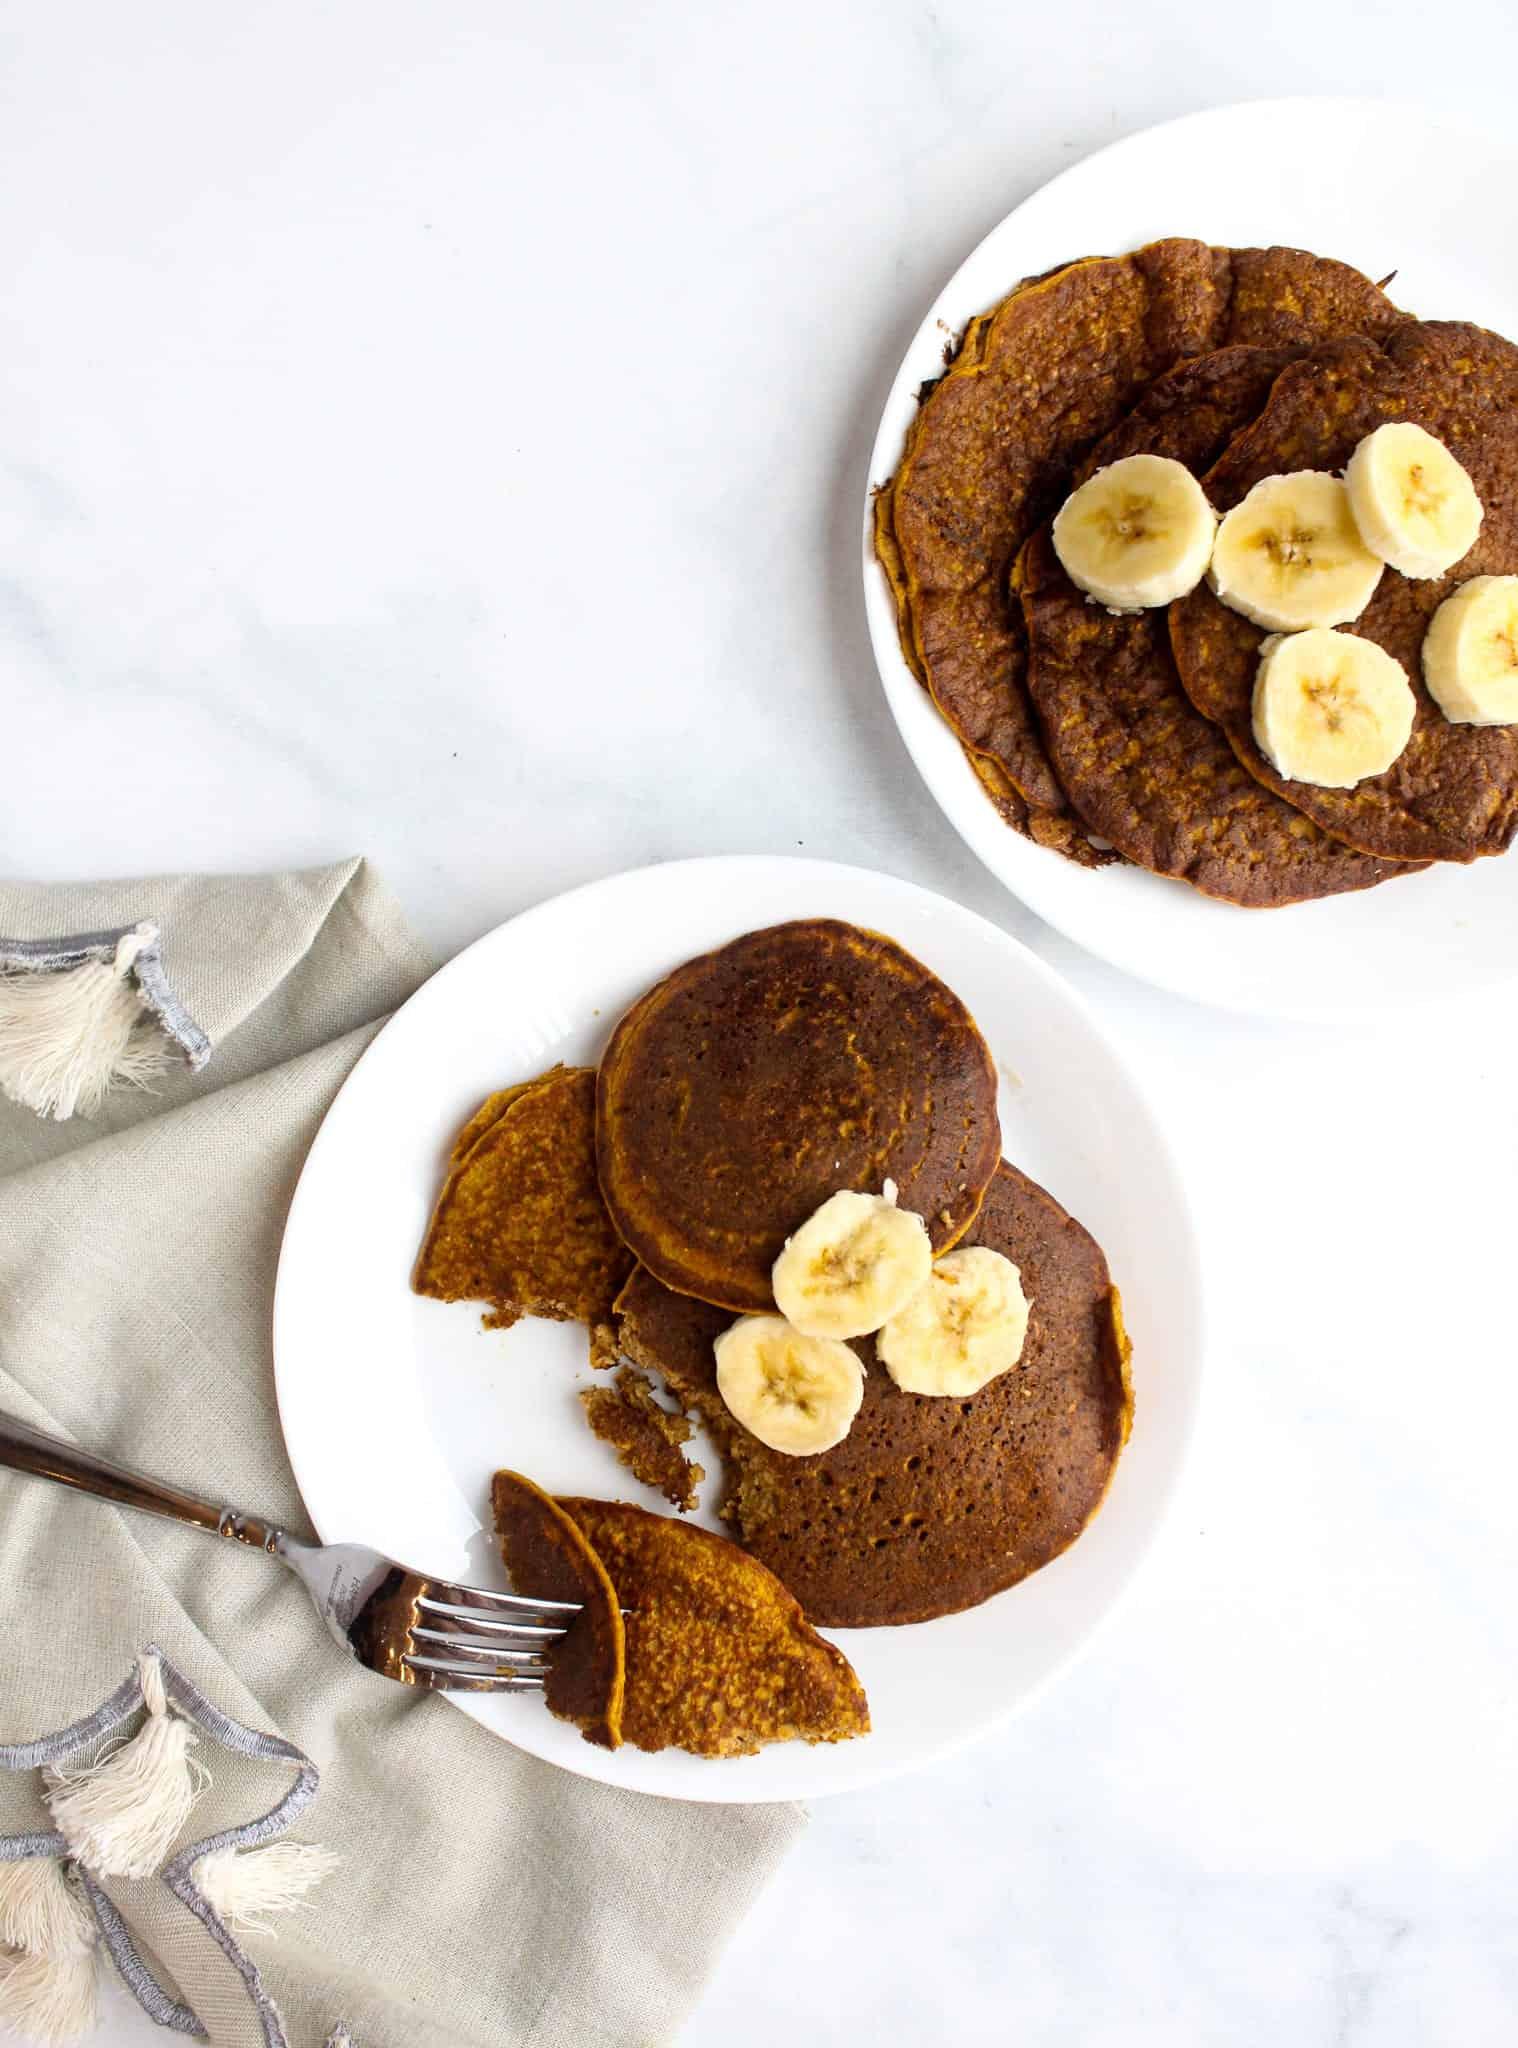 Pumpkin Blender Pancakes for One - #glutenfree #dairyfree #lowfodmap #breakfast #college #pumpkin